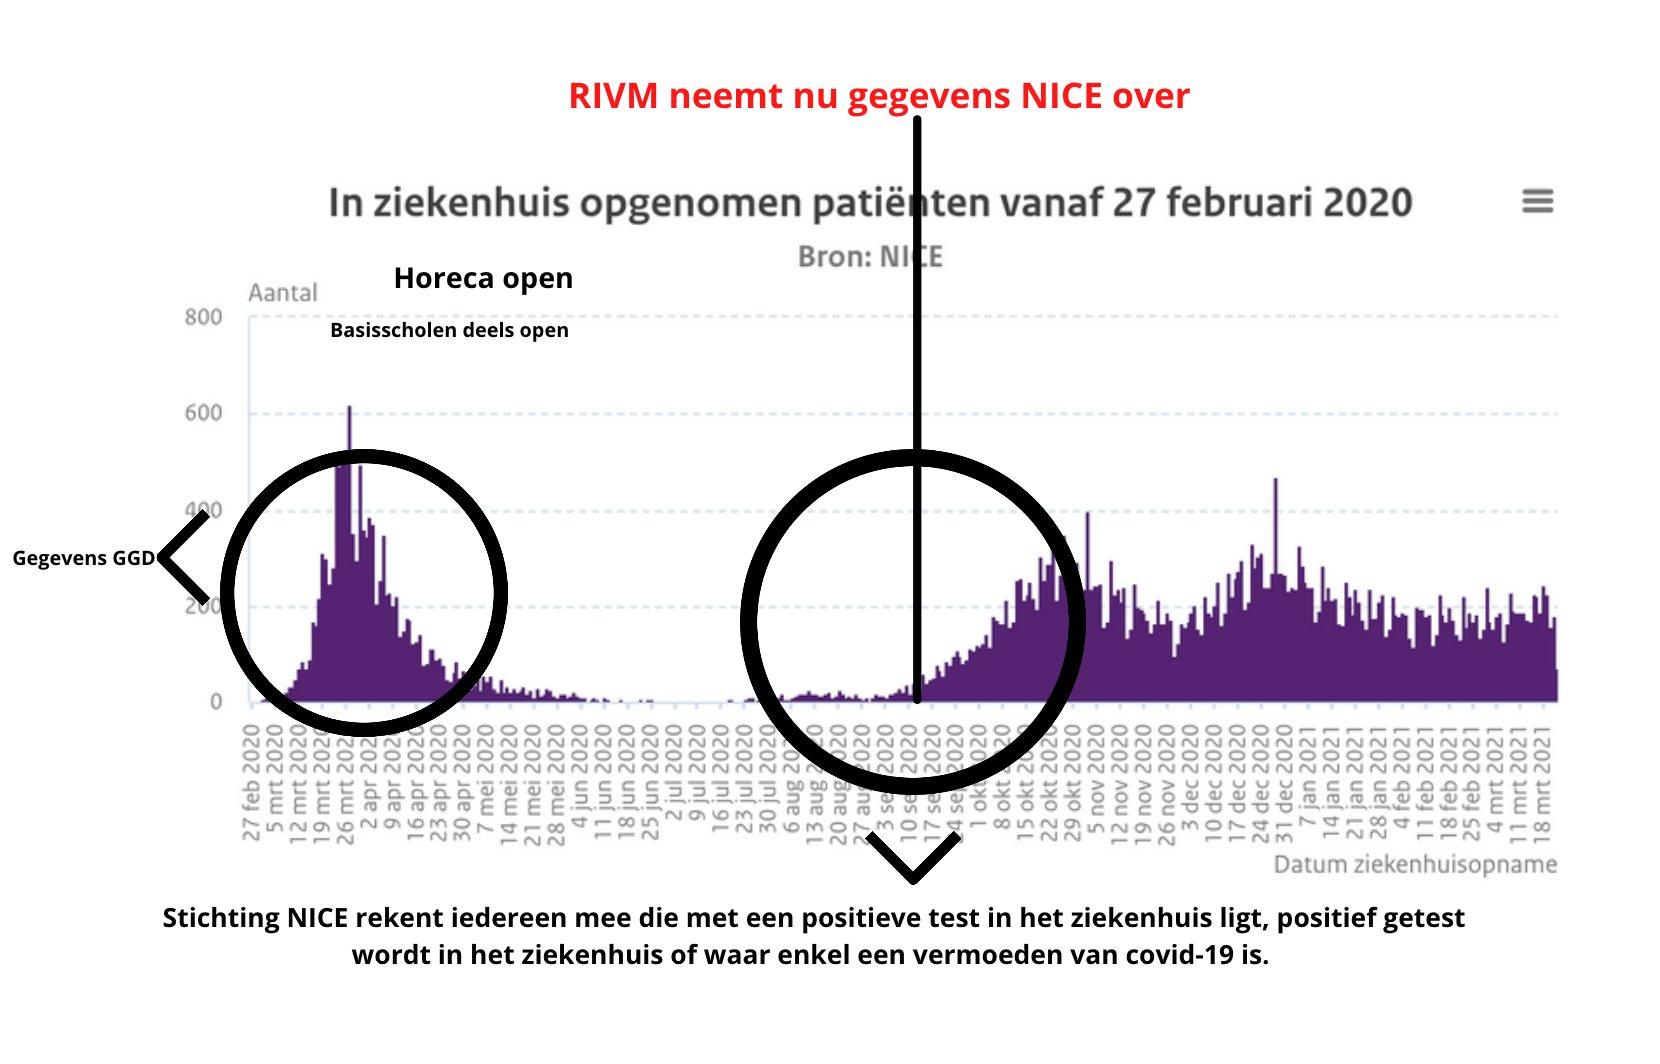 Stichting NICE